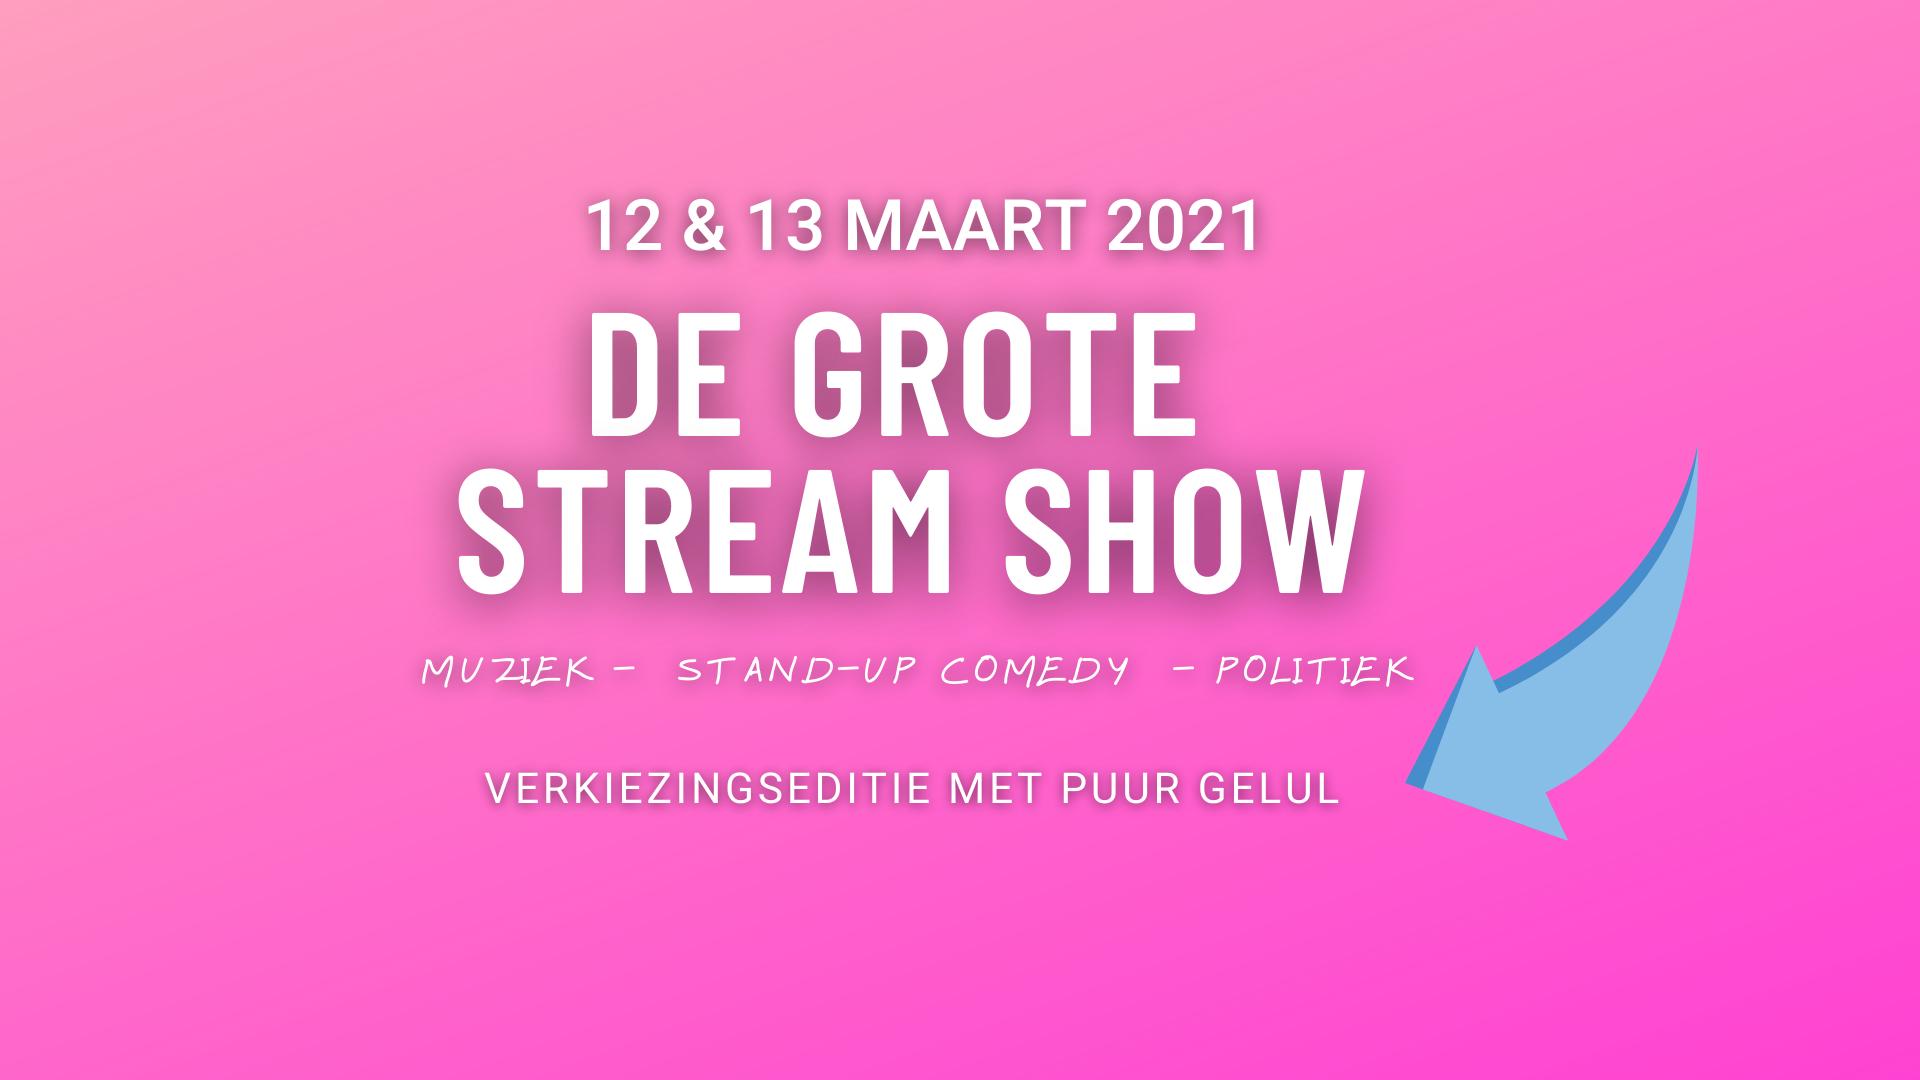 De Grote Stream Show: Verkiezingseditie